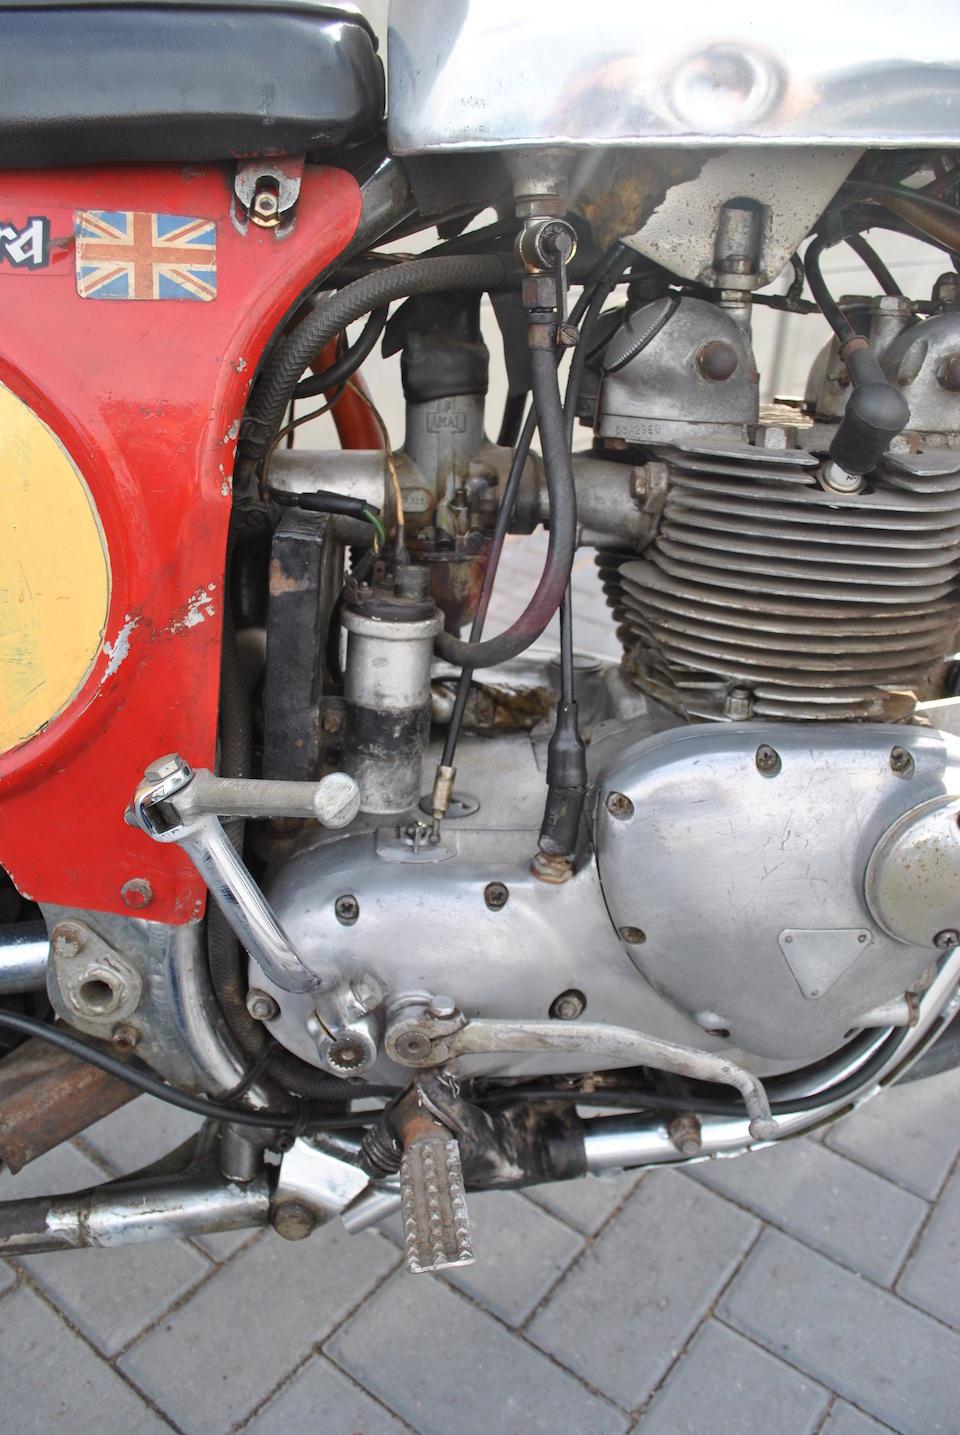 The ex-Jim Sandiford, ISDT,1970 Cheney Triumph 504cc Tiger 100C Frame no. MK2 102 Engine no. JD24845 T100C Jim Sandiford